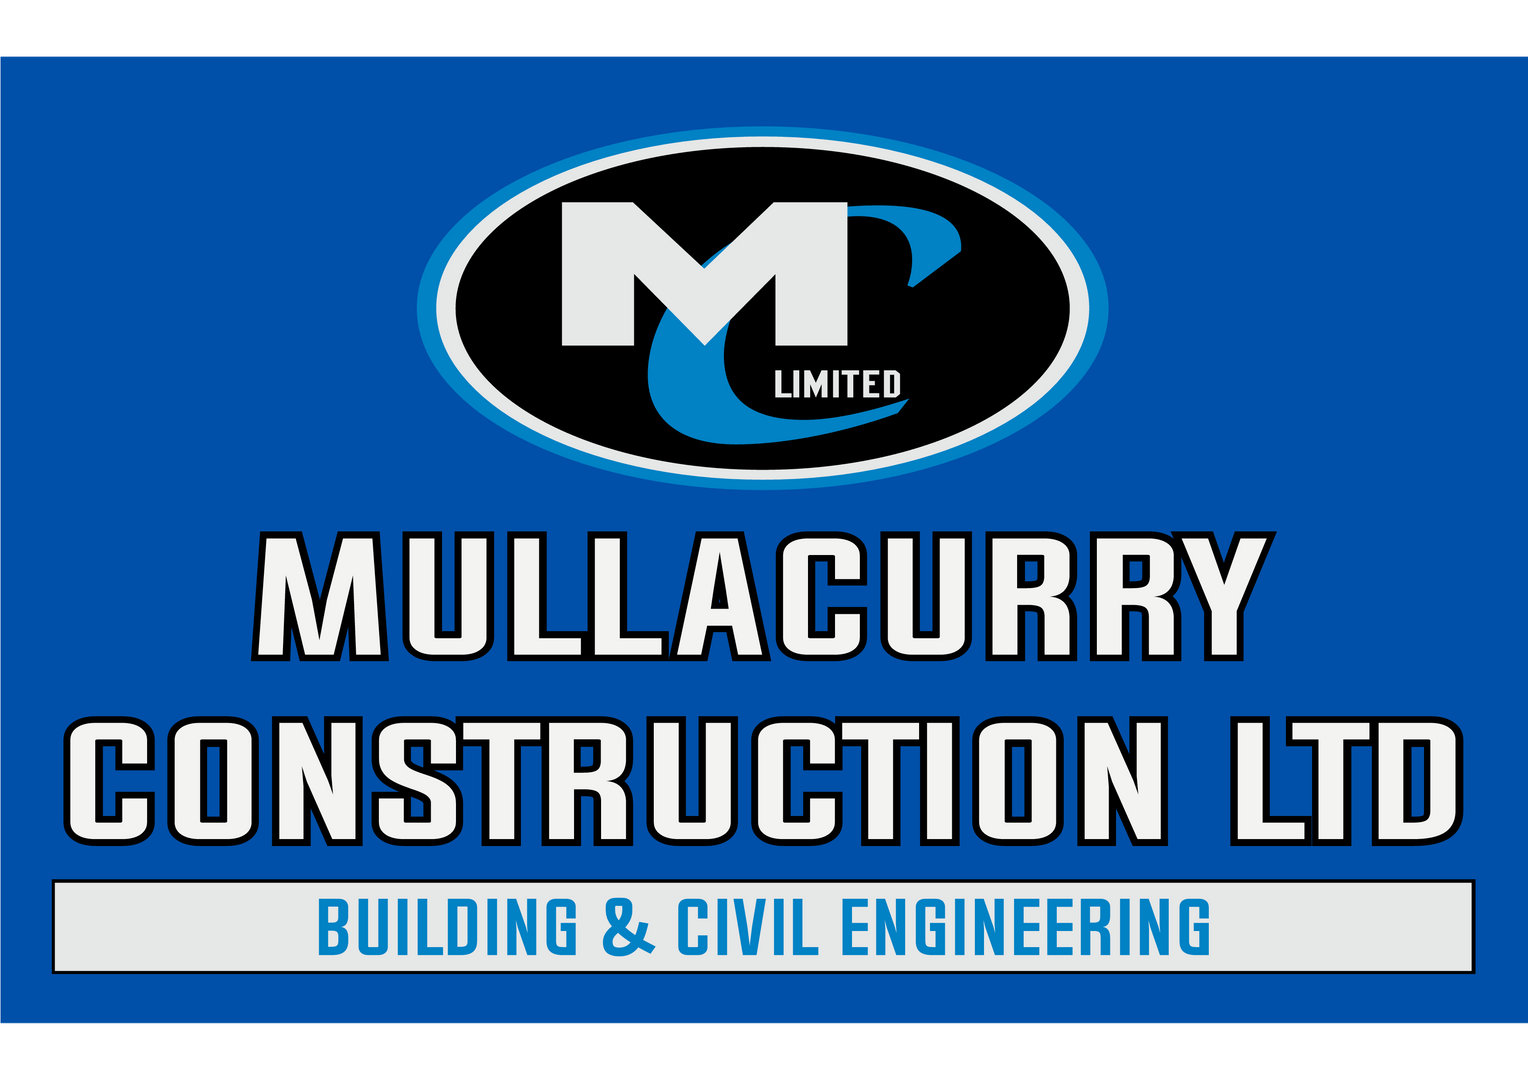 Mullacurry Construction LTD.